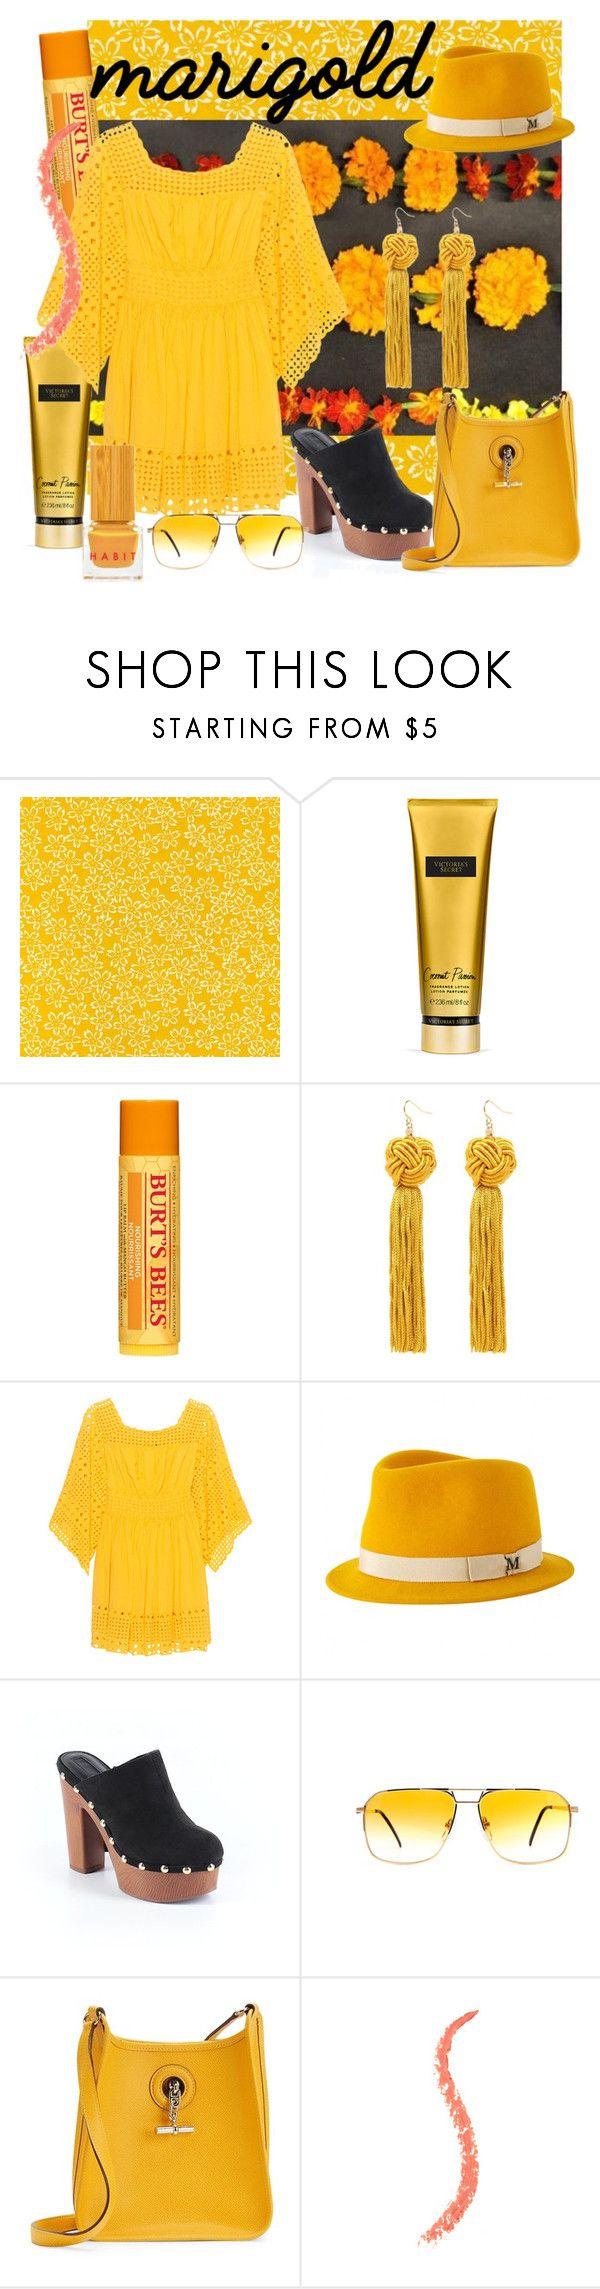 """Michele"" by alejandra-soraires on Polyvore featuring moda, Victoria's Secret, Burt's Bees, Plein Sud Jeanius, Maison Michel, Forever 21, Hermès y Habit Cosmetics"